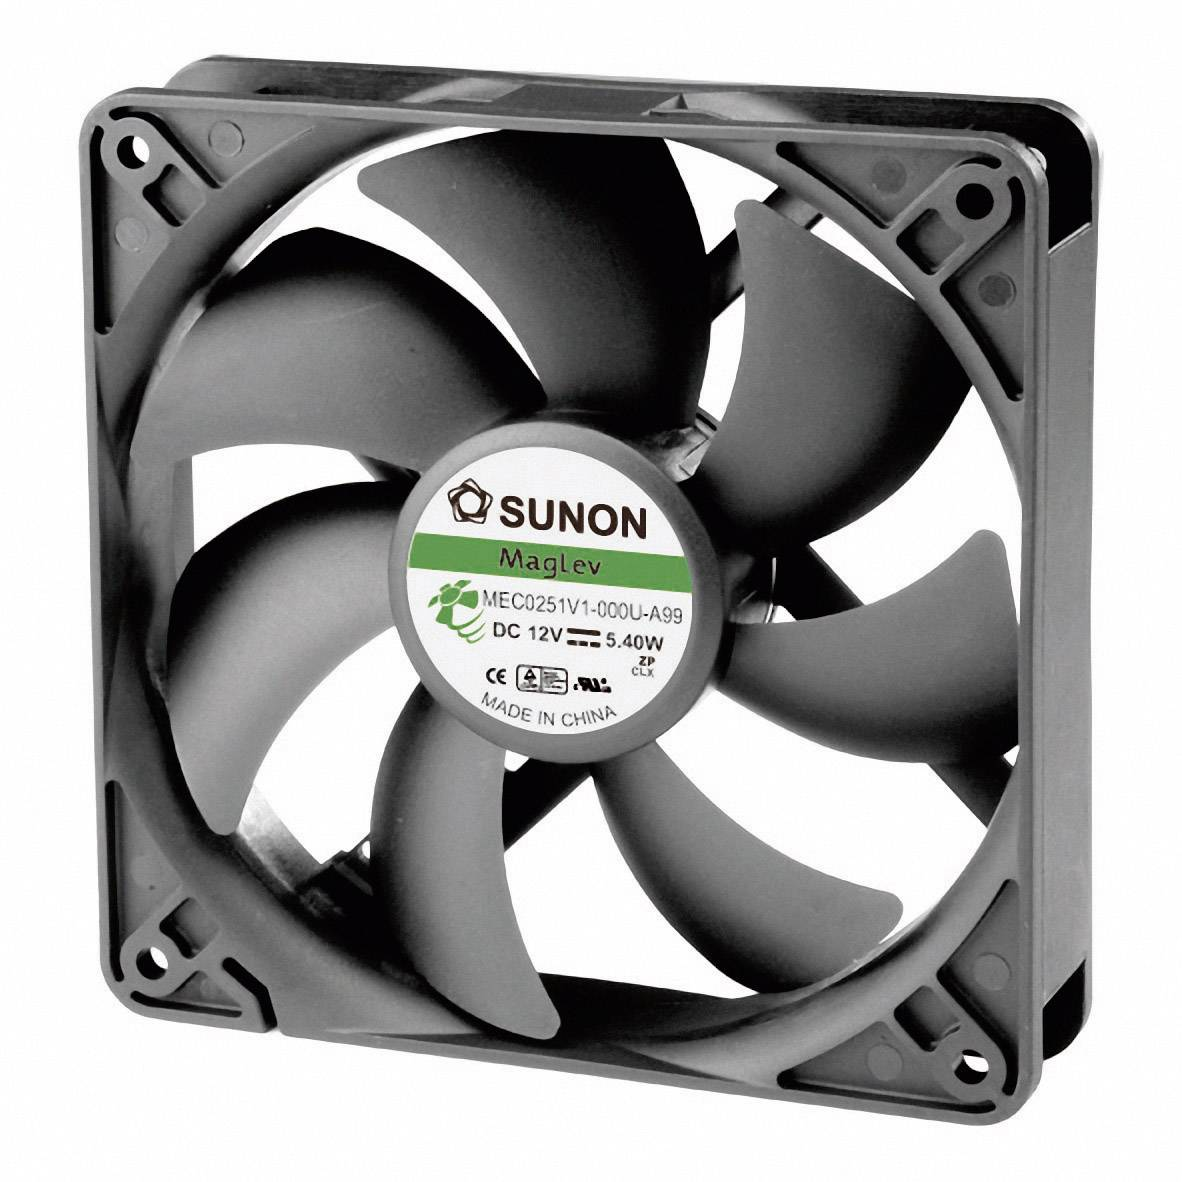 Axiálny ventilátor Sunon MEC0251V1-000U-A99 MEC0251V1-000U-A99, 12 V/DC, 44.5 dB, (d x š x v) 120 x 120 x 25 mm